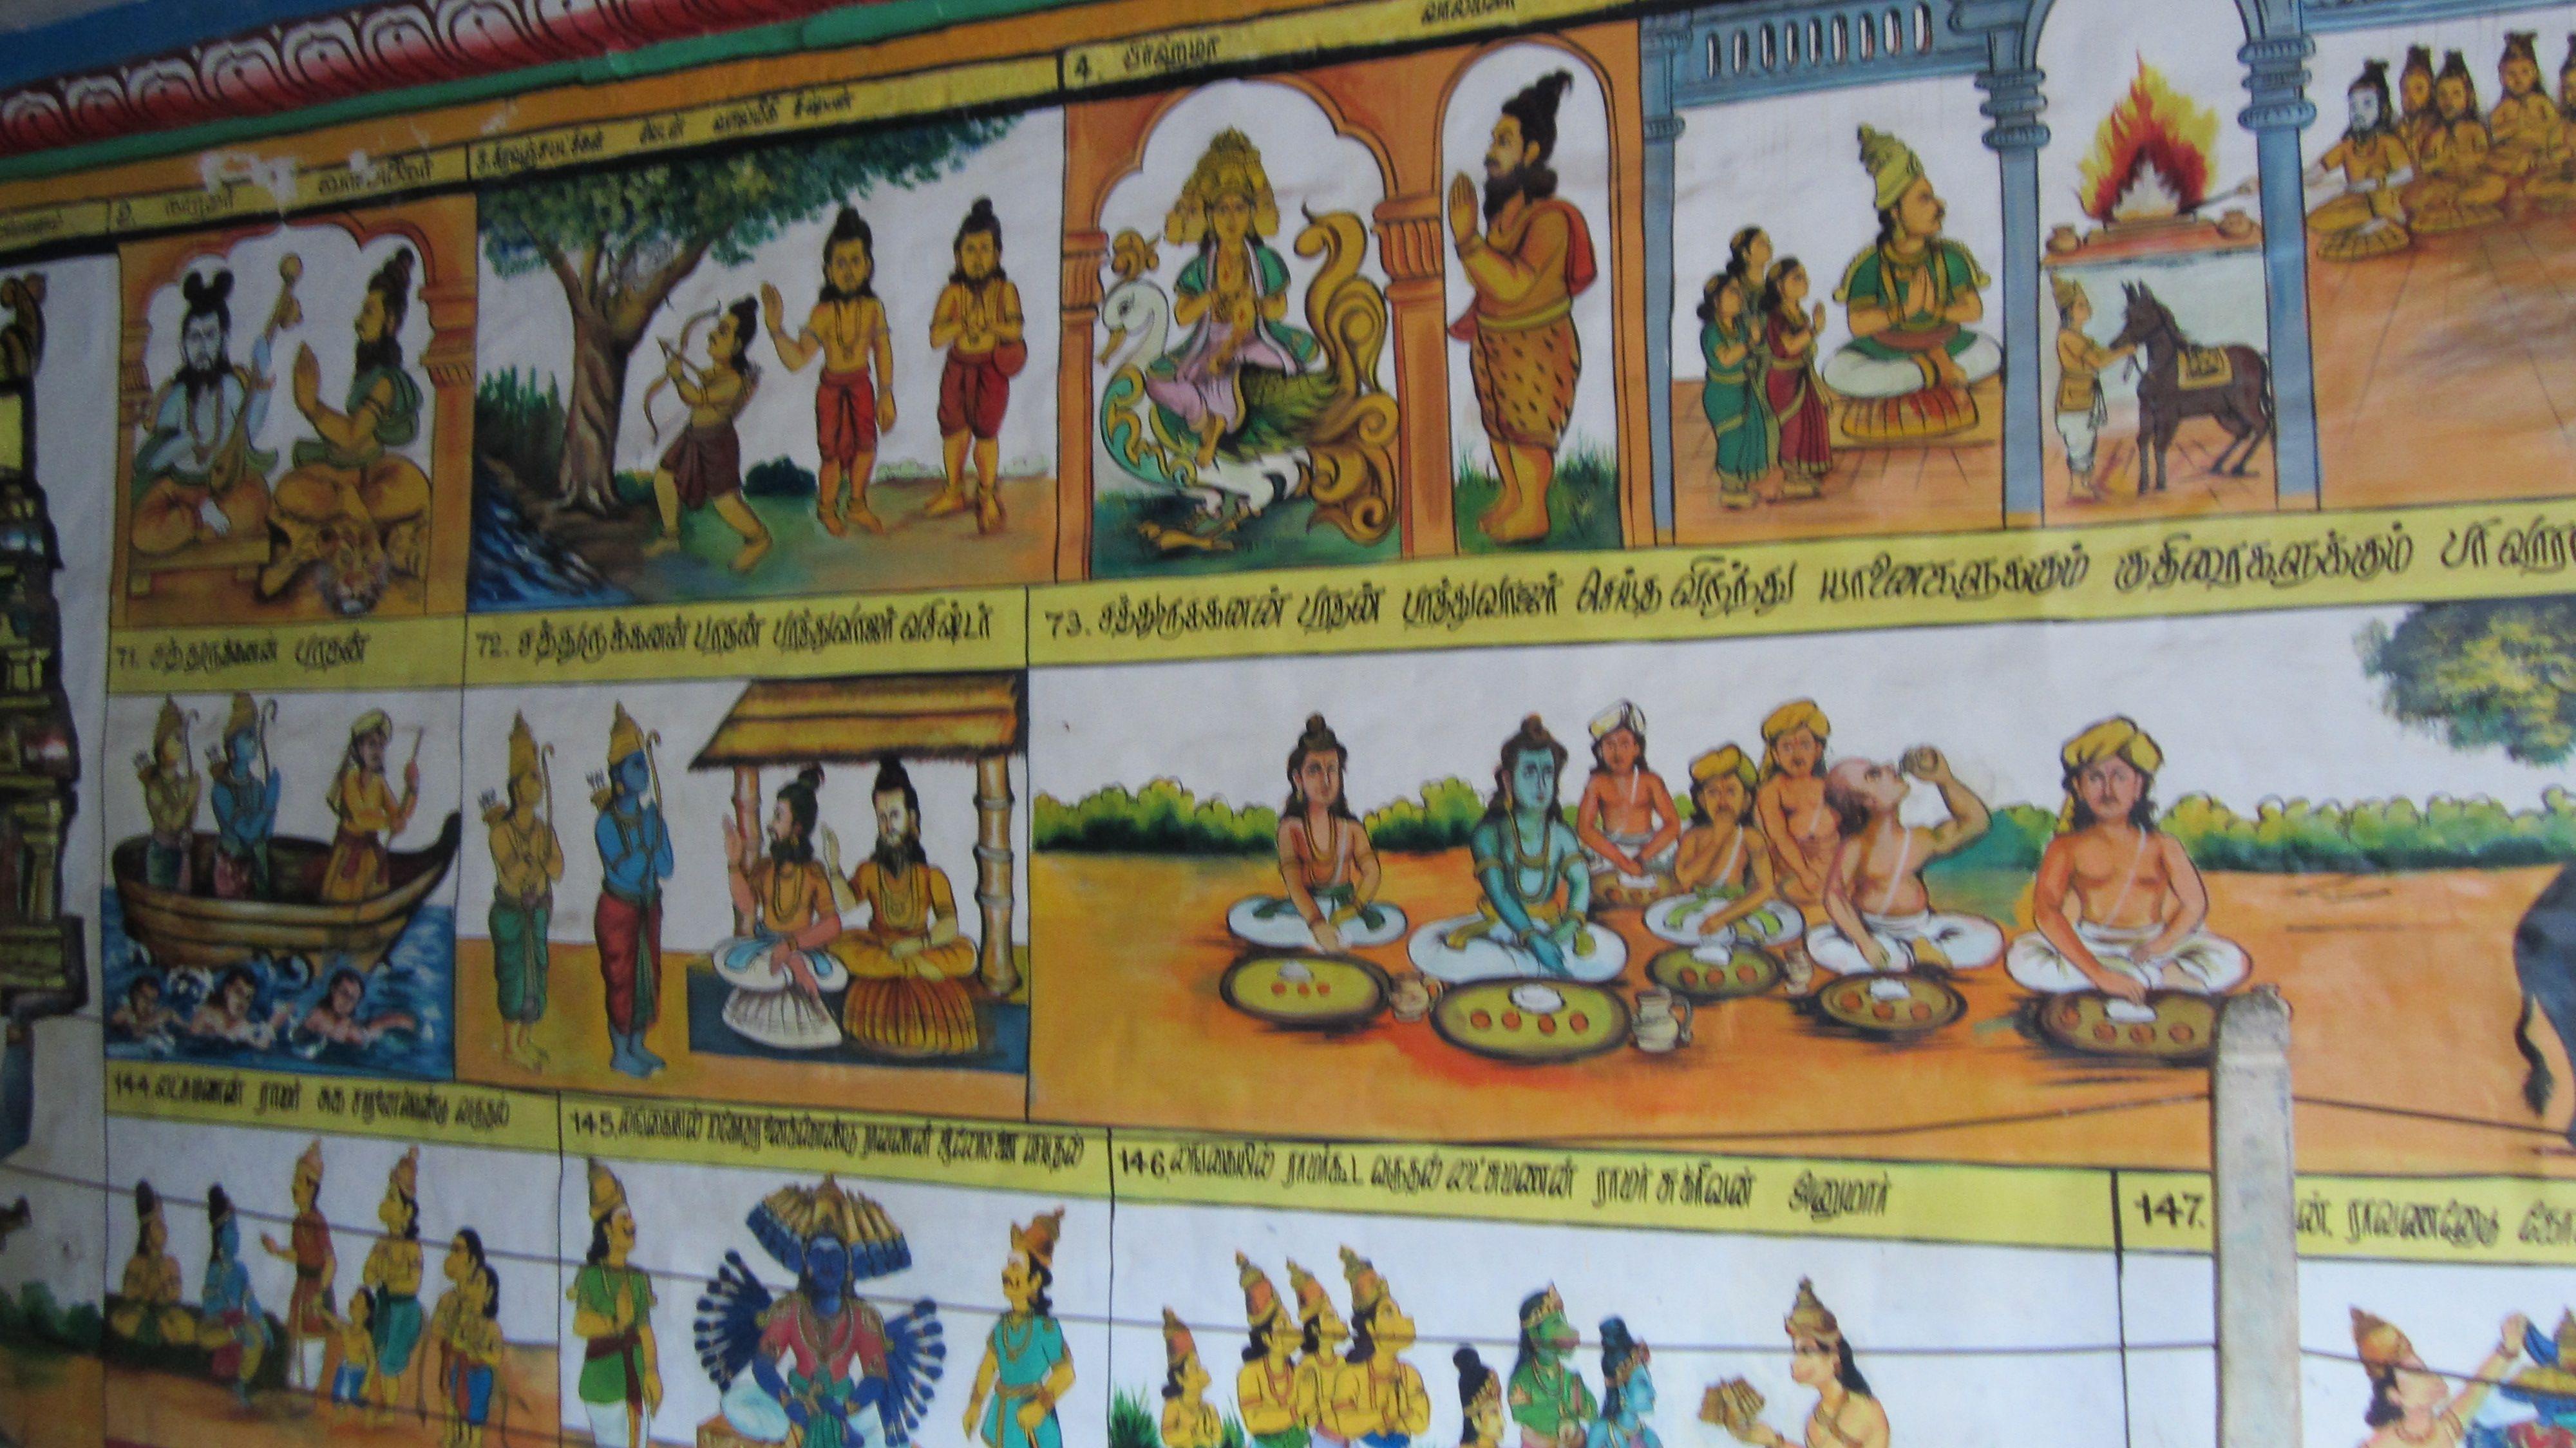 Ramaswamy Temple - Kumbakonam - India - Ramayana paintings | Temple art,  Painting, Art